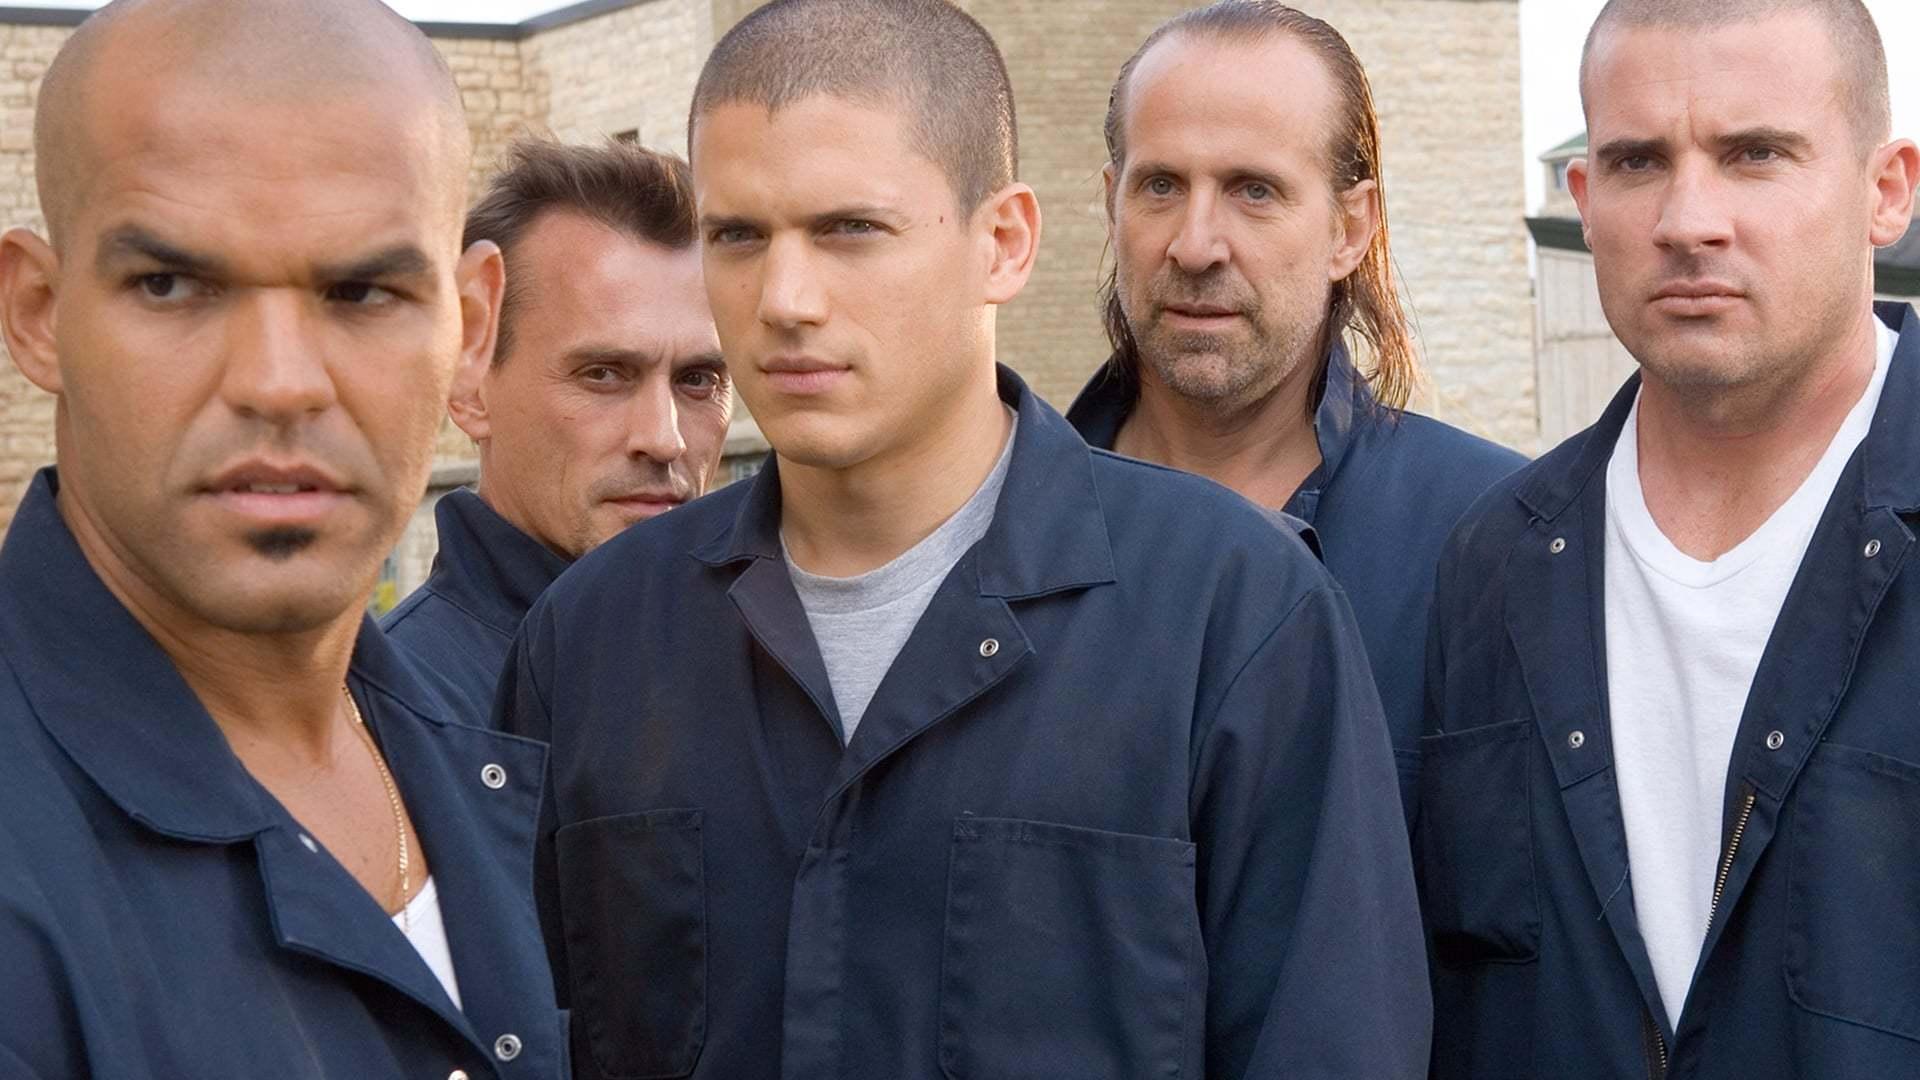 Кадры из фильма Побег Prison Break 2005